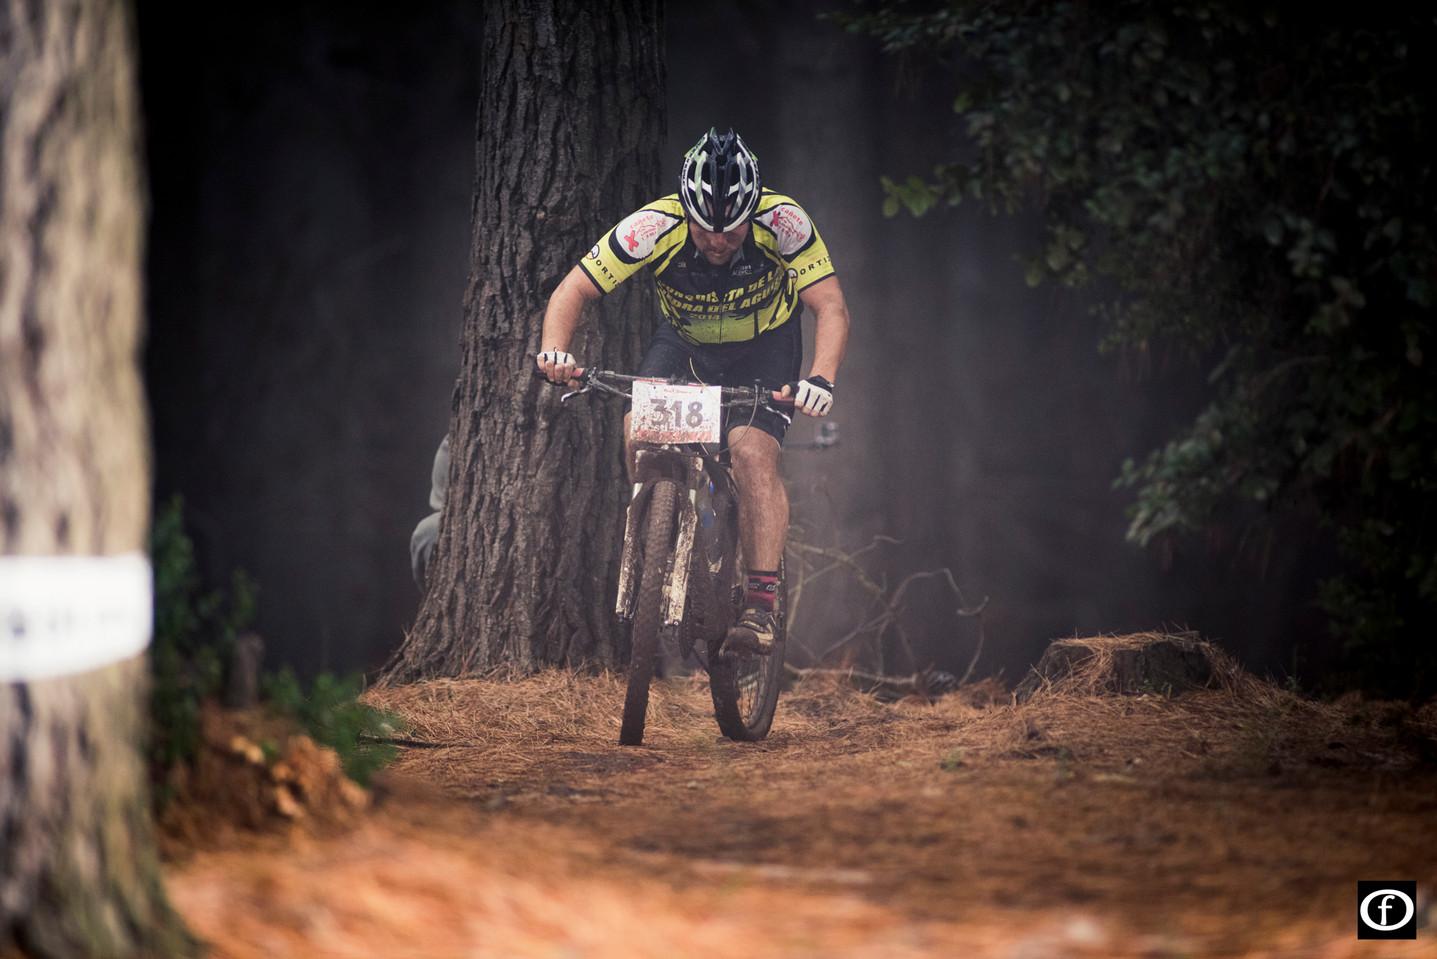 2015-05-17-Ciclismo Enduro-43.jpg